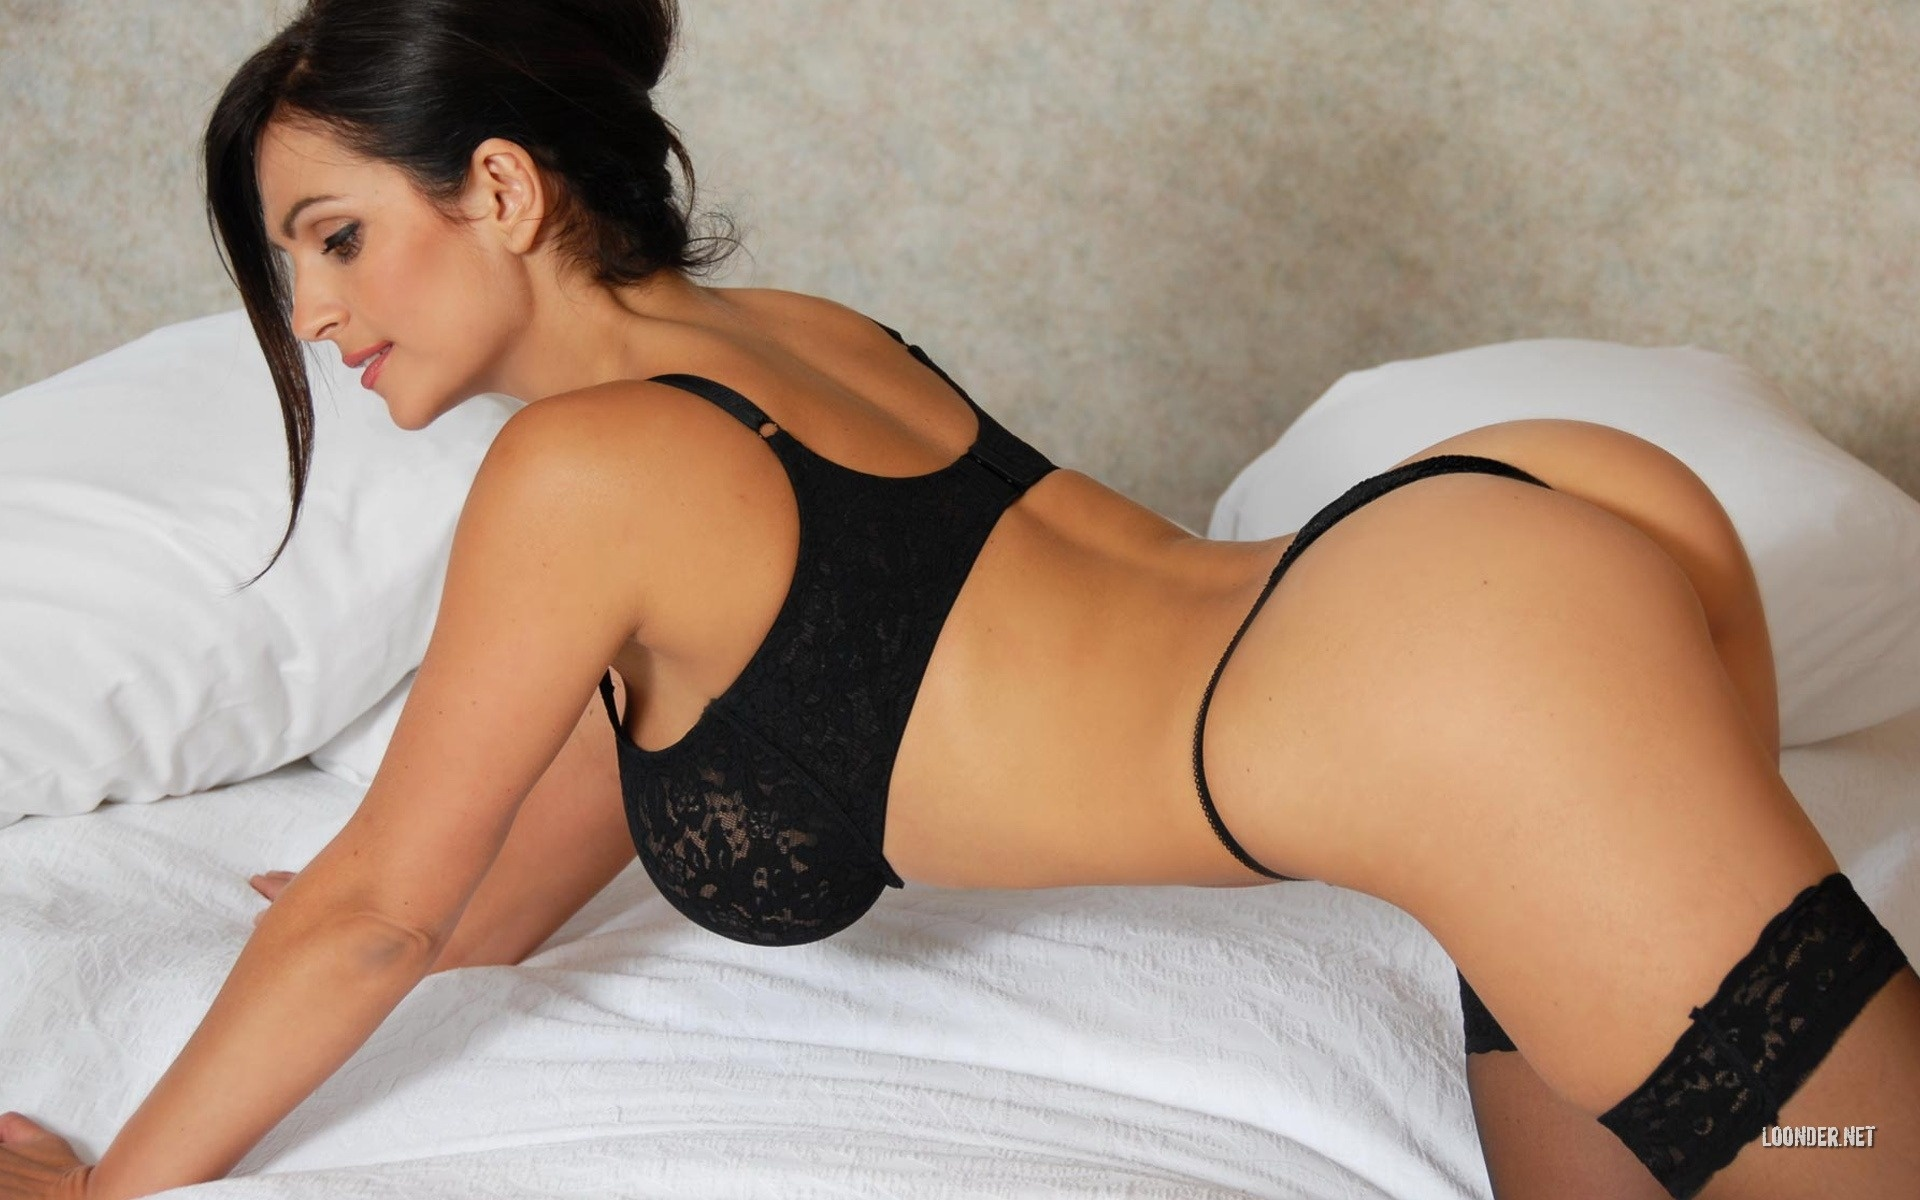 Girl boobs full hd hot